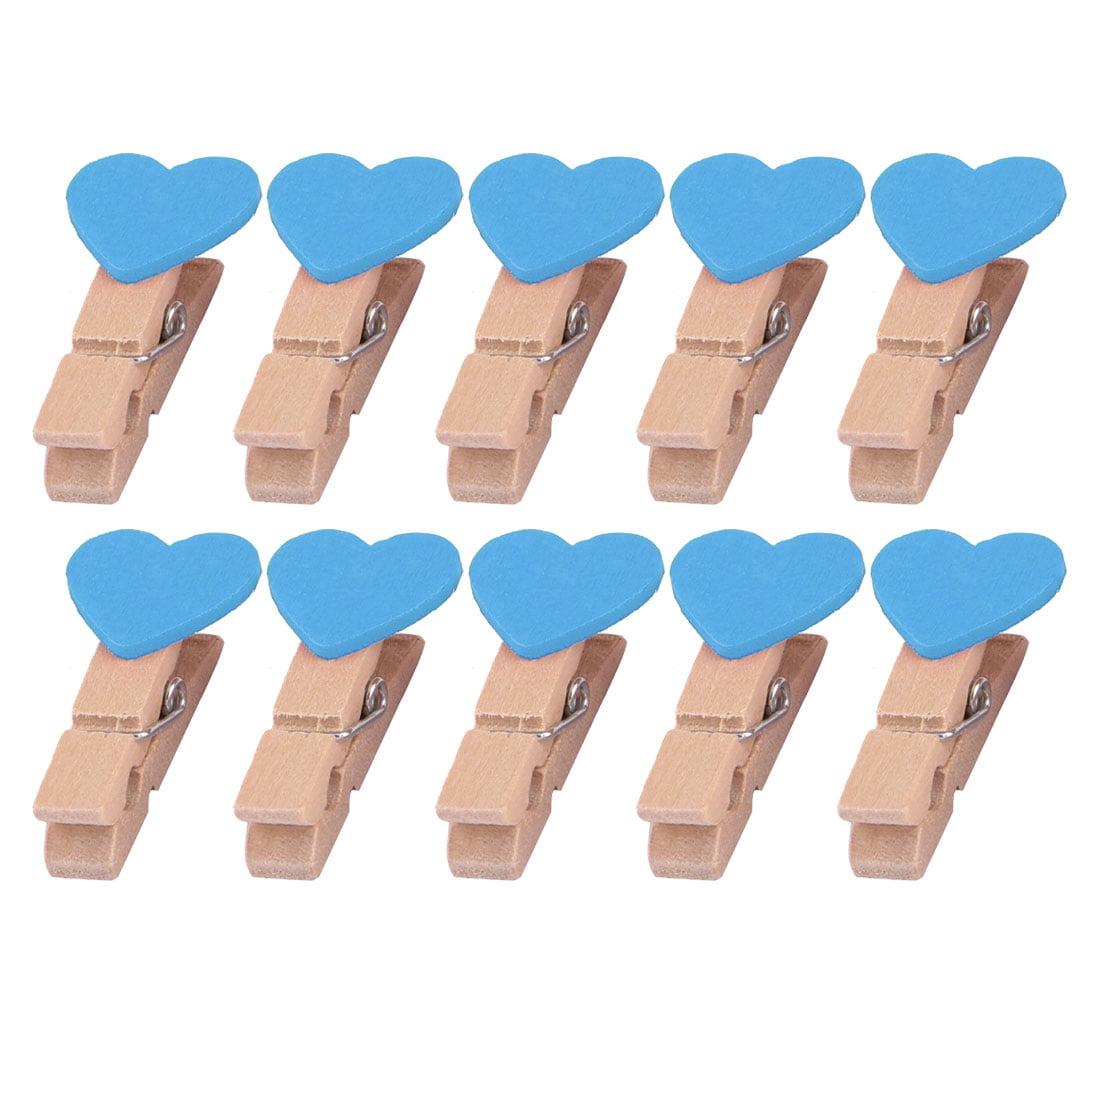 Family Wooden Heart Shape DIY Crafts Card Photo Ornament Peg Clip Blue 10pcs